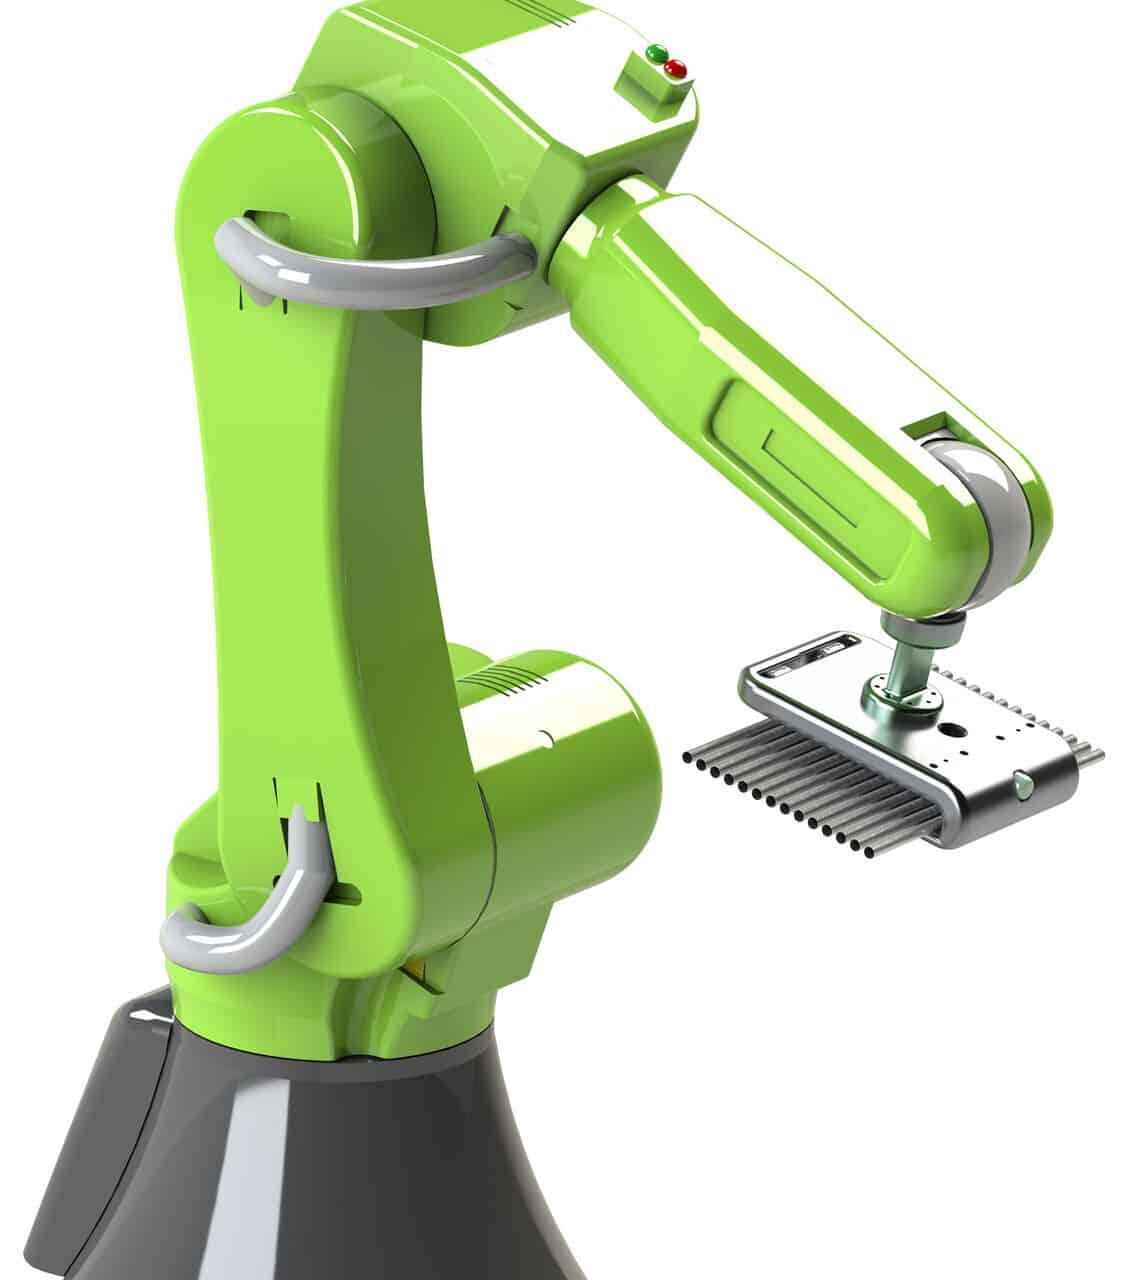 Ergonomic Operator Assistant Robot